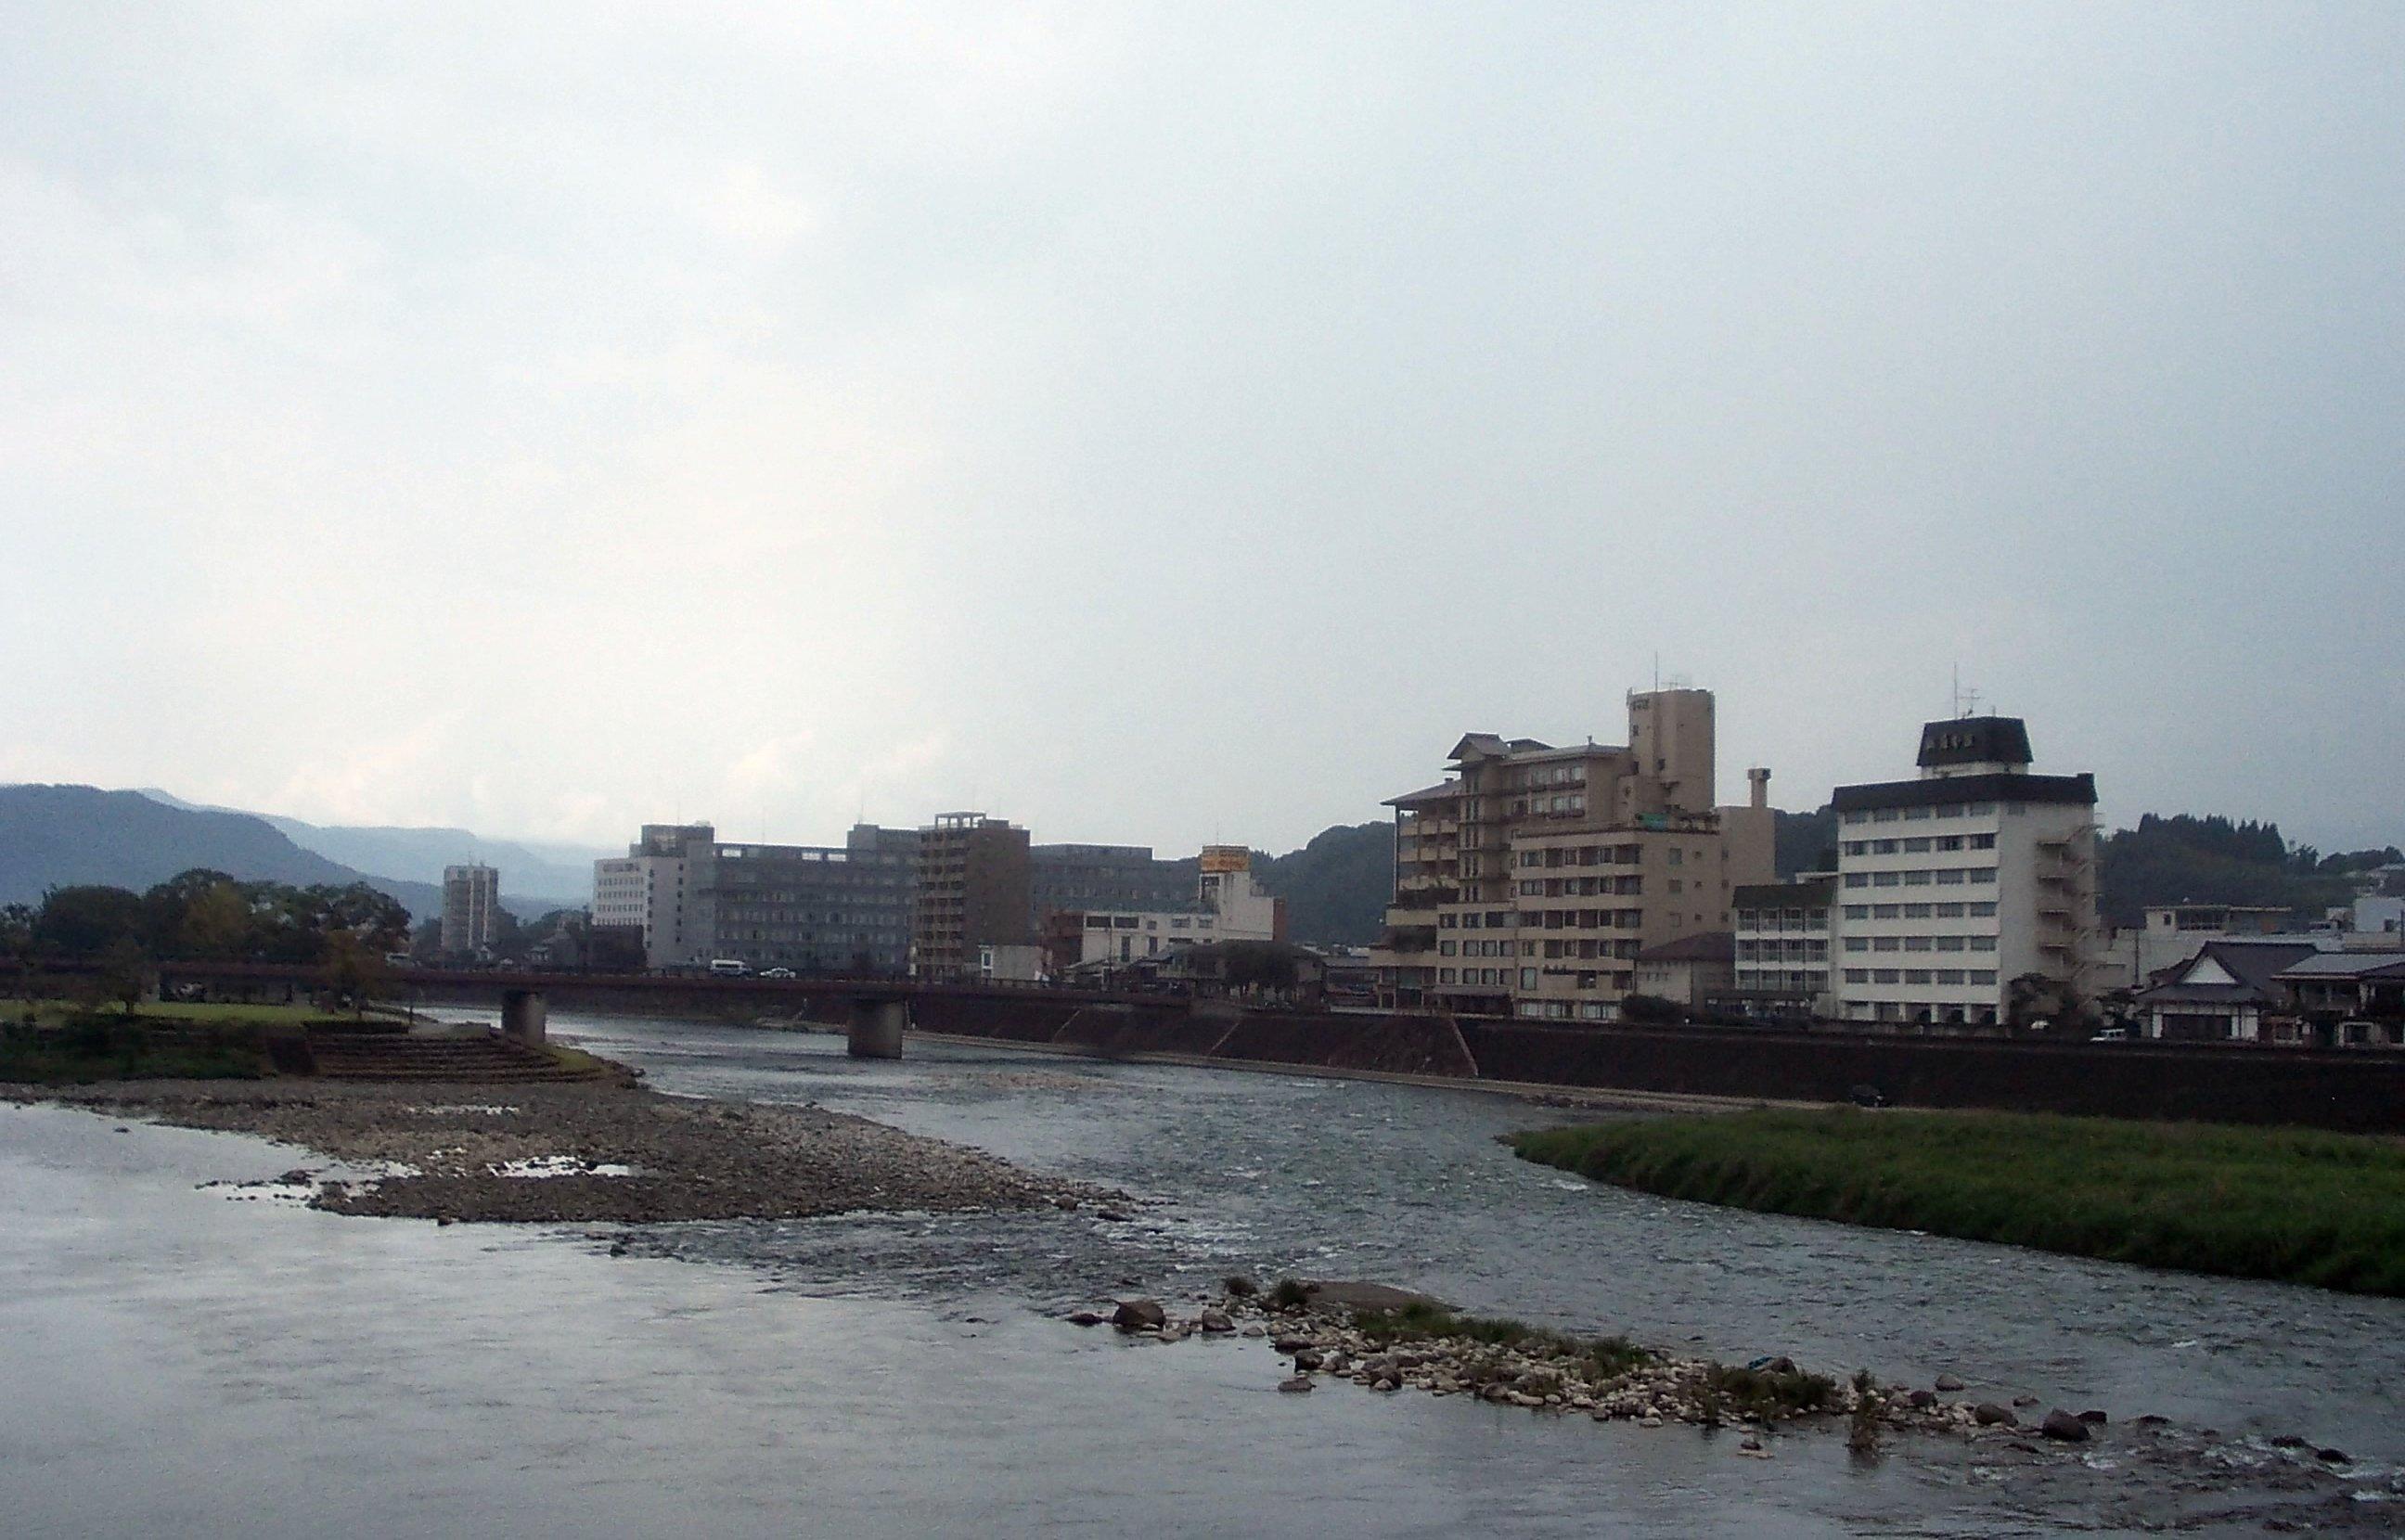 https://upload.wikimedia.org/wikipedia/commons/c/c8/Kuma_River_in_Hitoyoshi.jpg